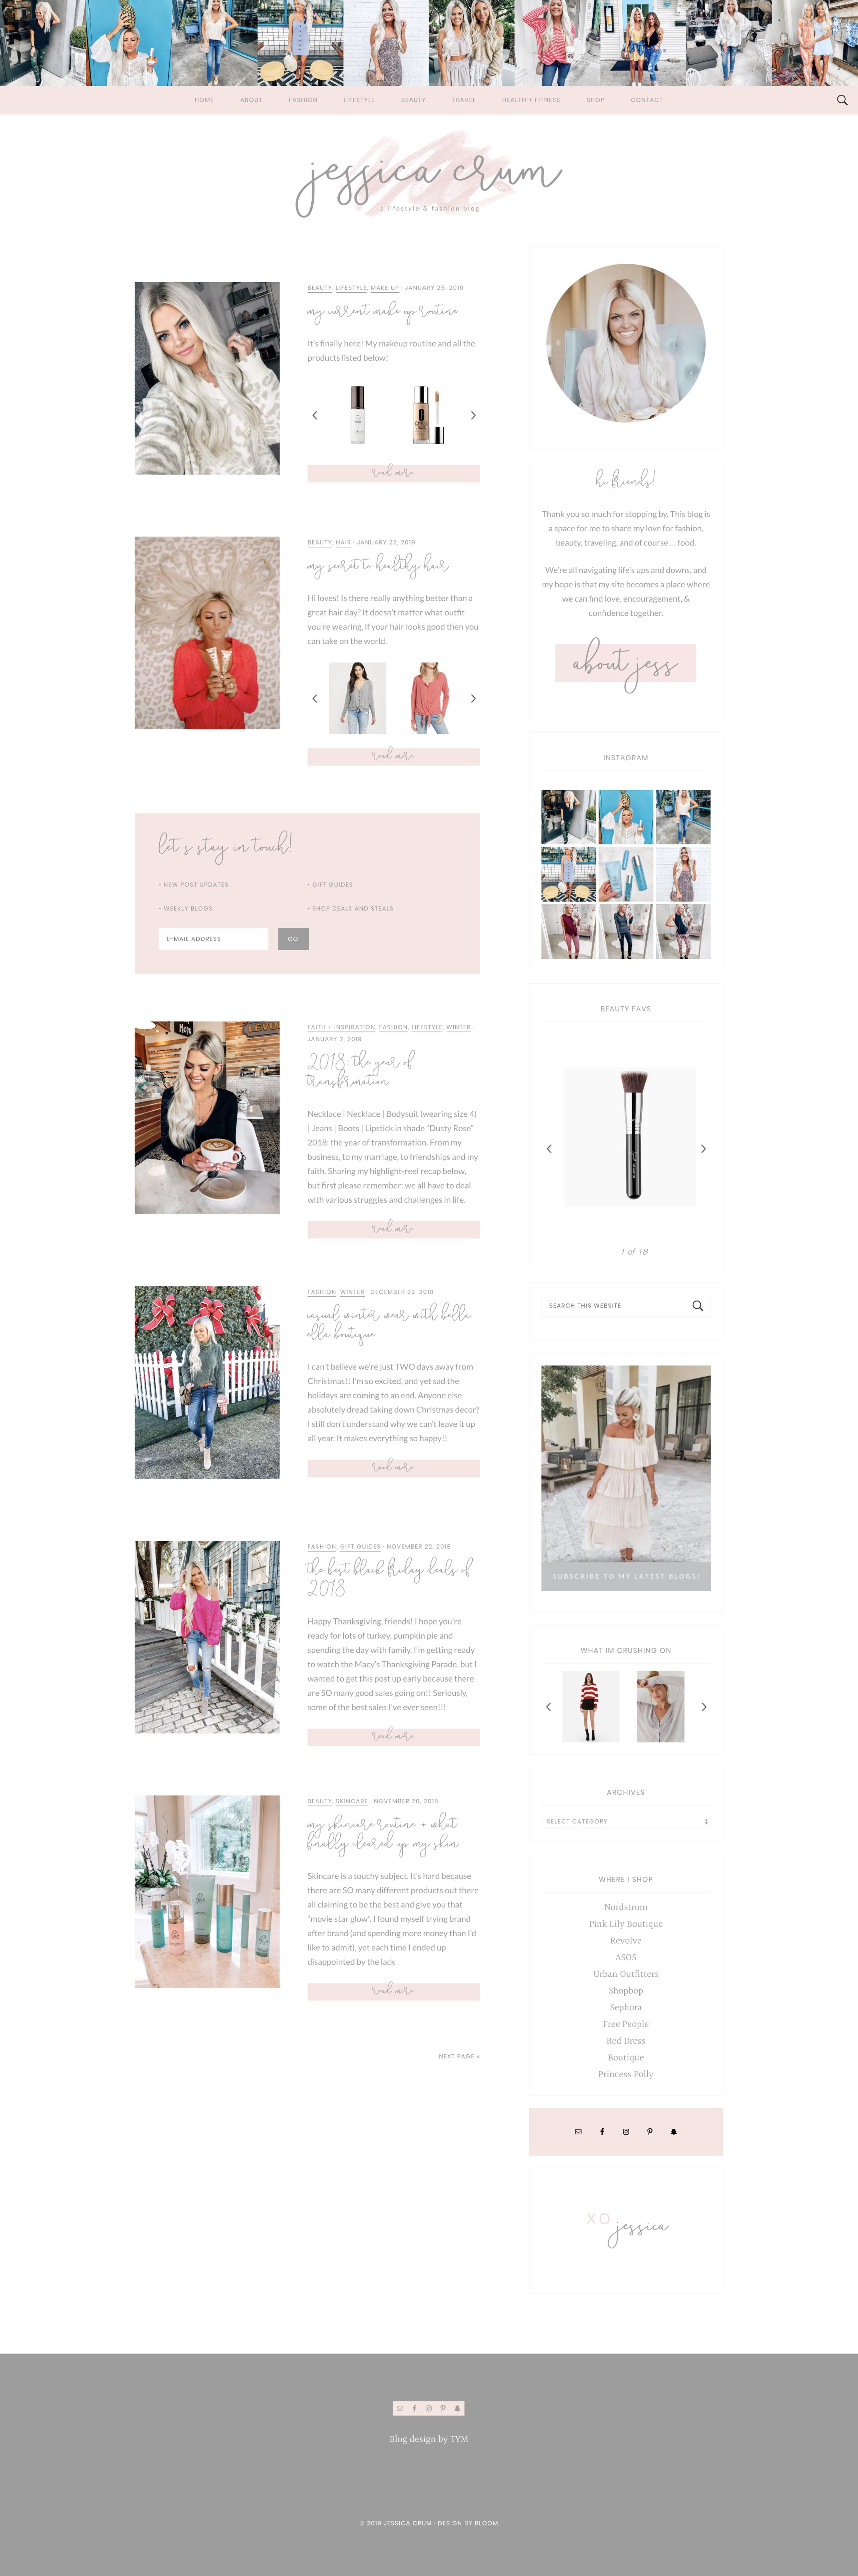 Jessica Crum Homepage Trek Your Market